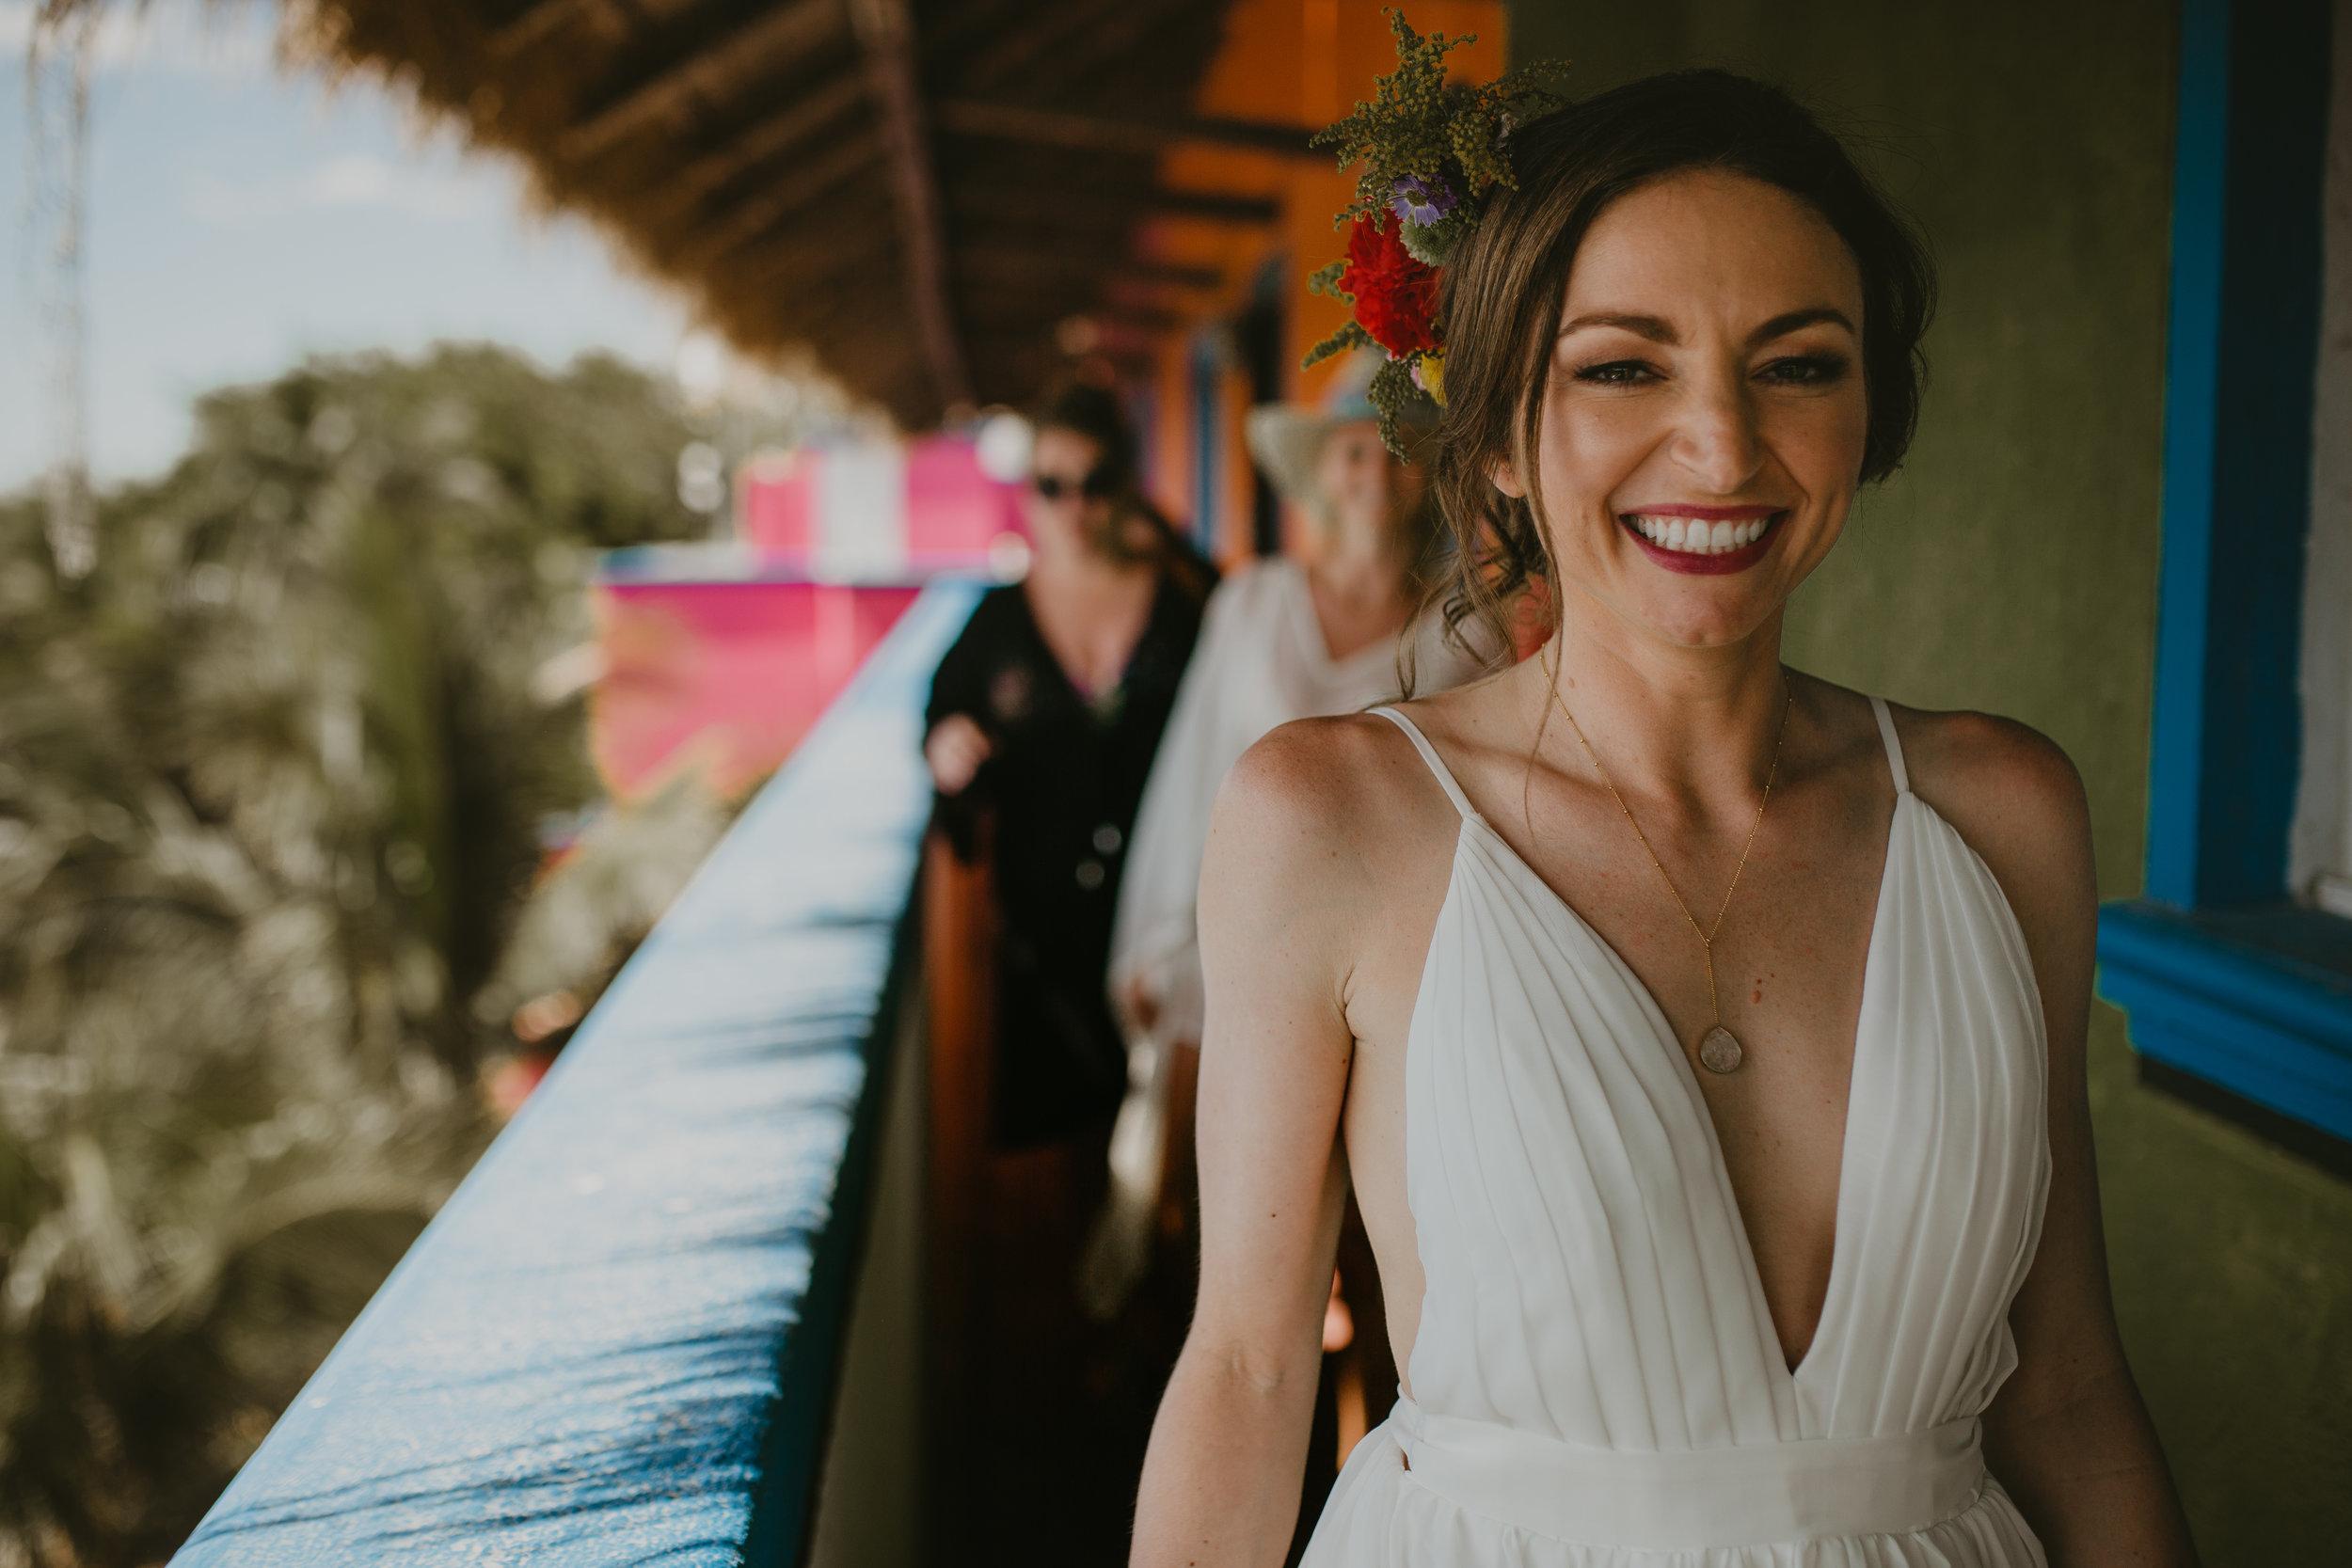 Nicole-Daacke-Photography-beachfront-akumal-destionation-wedding-tulum-mexico-elopement-photographer-destination-wedding-inspiration-sunset-champagne-pop-boho-bride-ocean-tropical-bohemian-tulum-wedding-photos-101.jpg